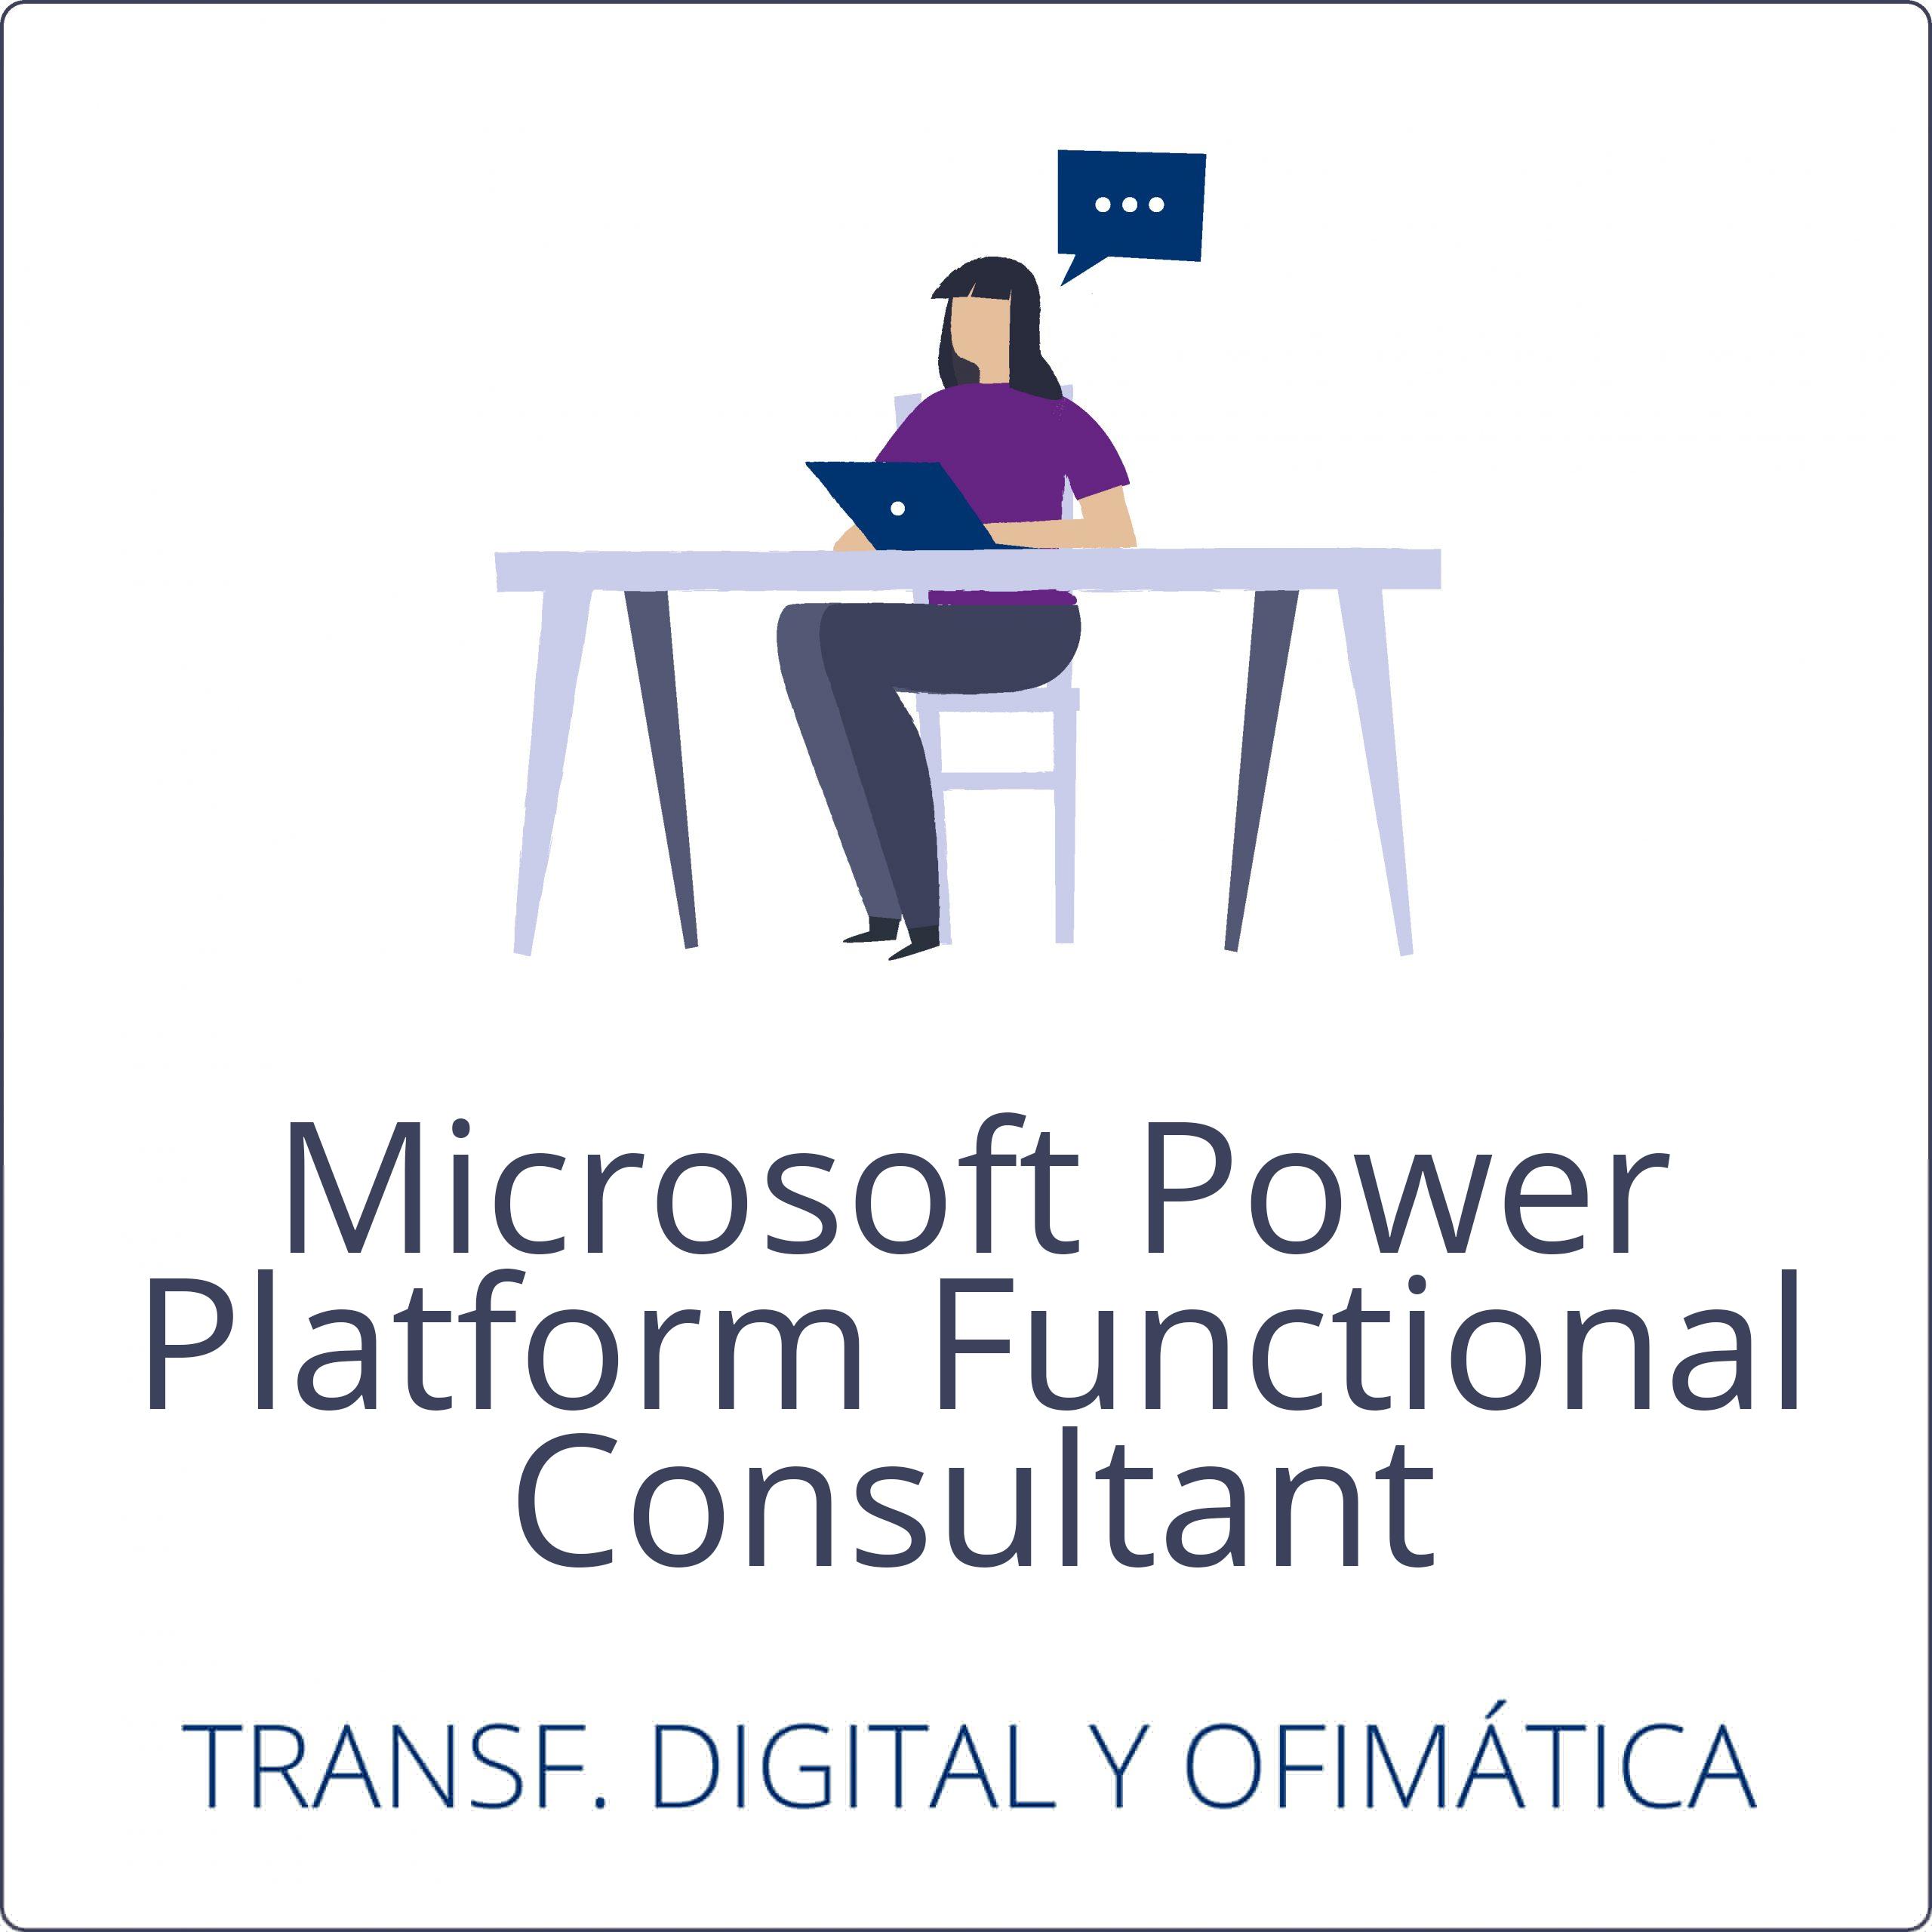 Microsoft Power Platform Functional Consultant